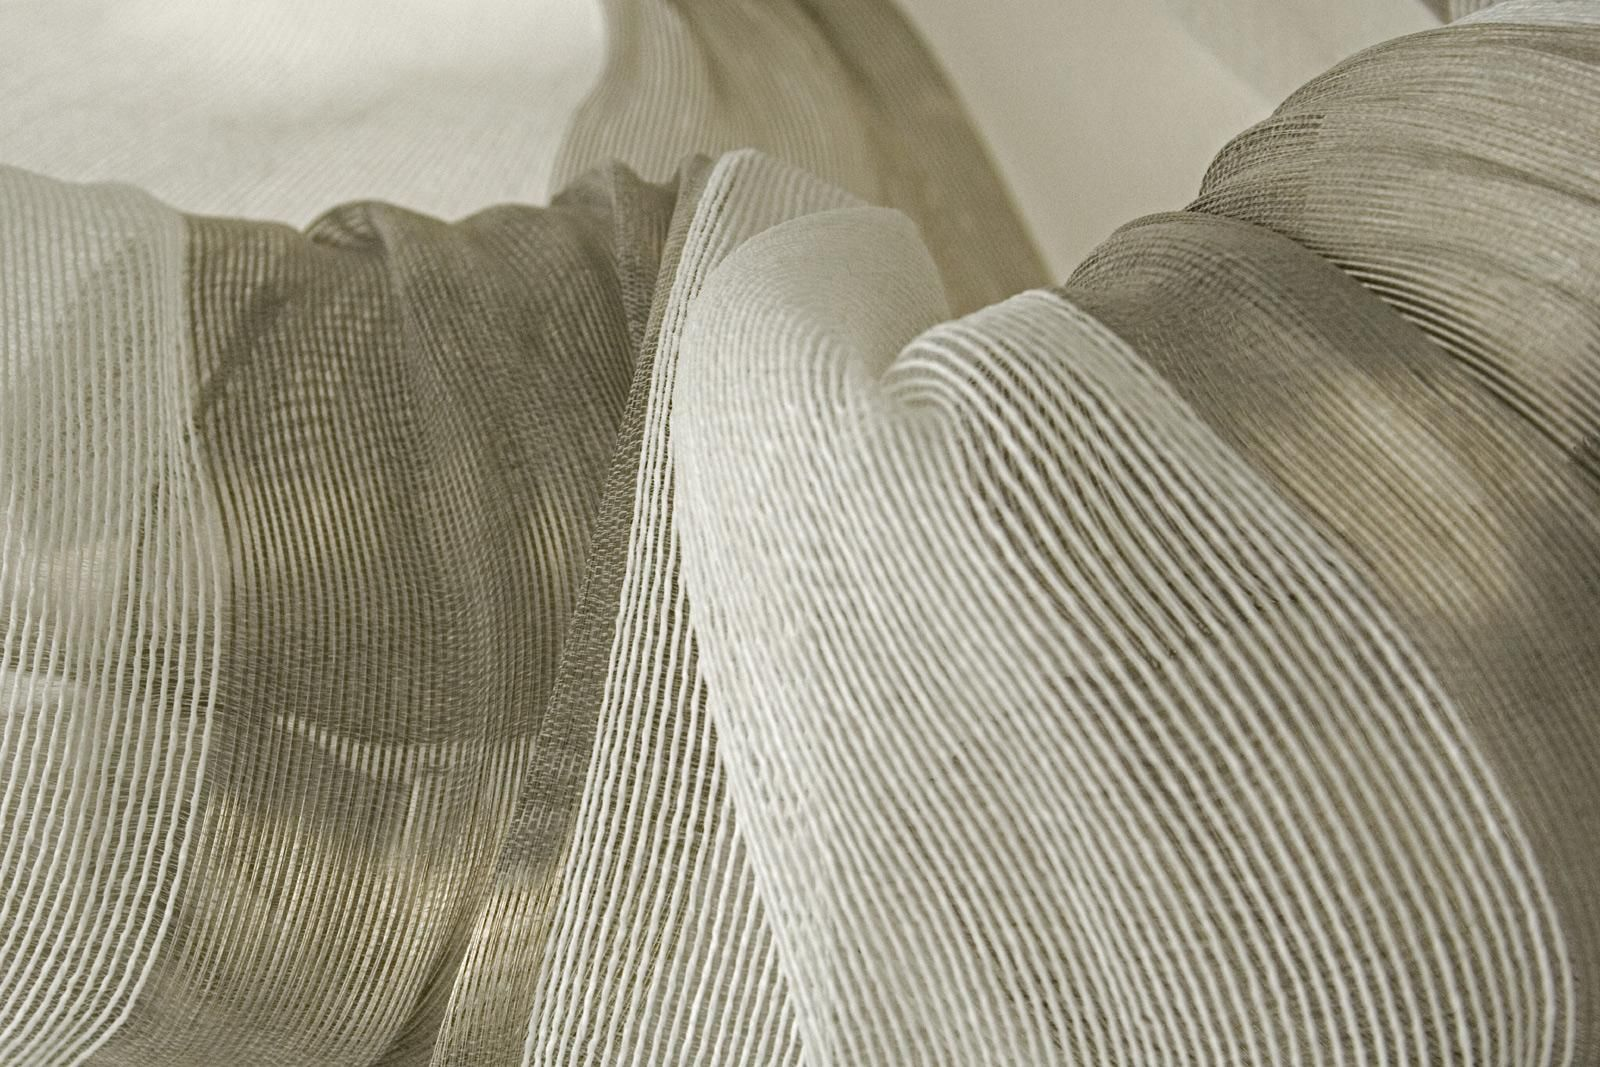 Image result for ANNEMETTE BECK textiles metal waves